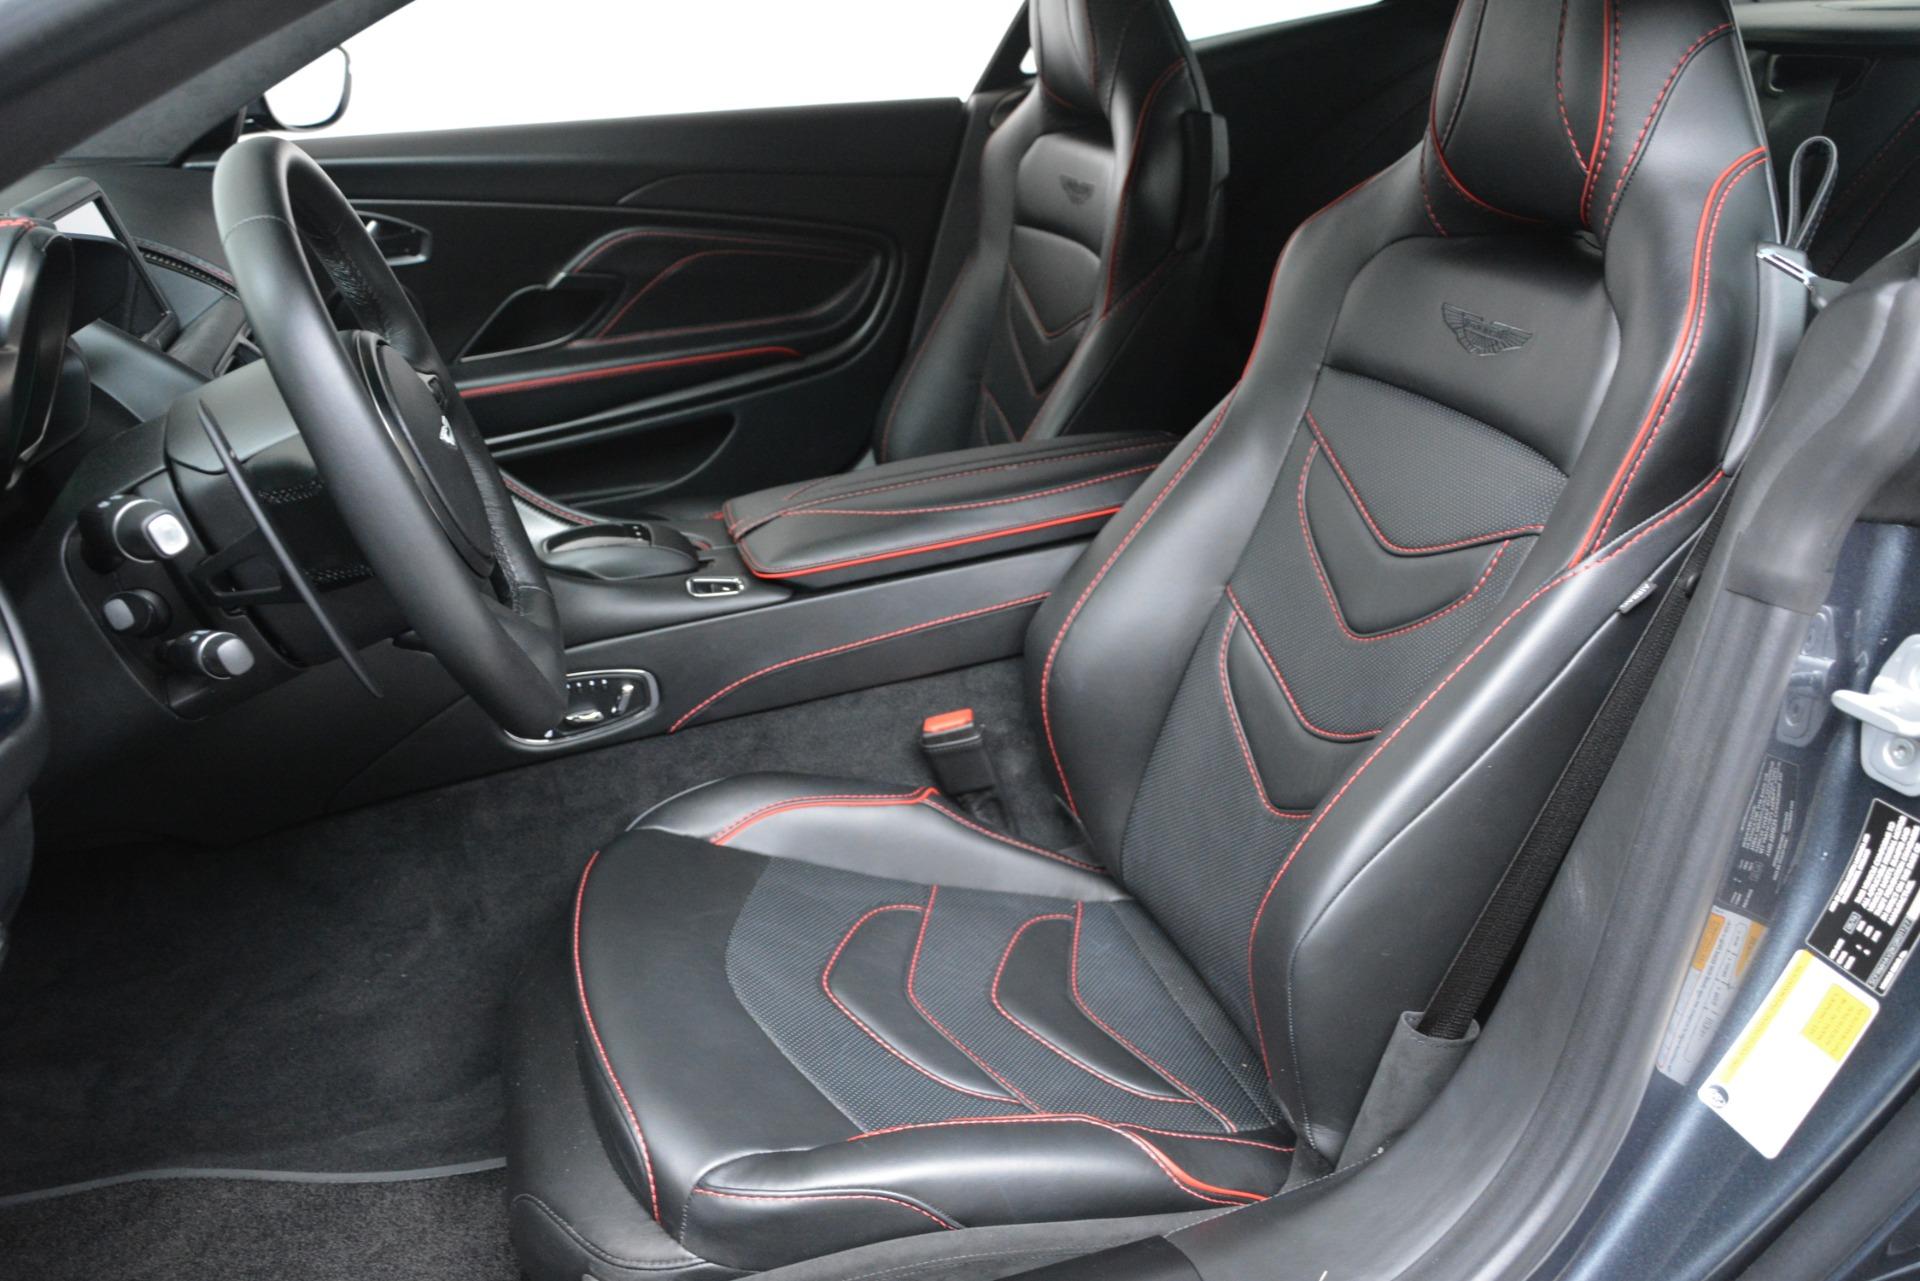 New 2019 Aston Martin DBS Superleggera Coupe For Sale In Greenwich, CT 3318_p13